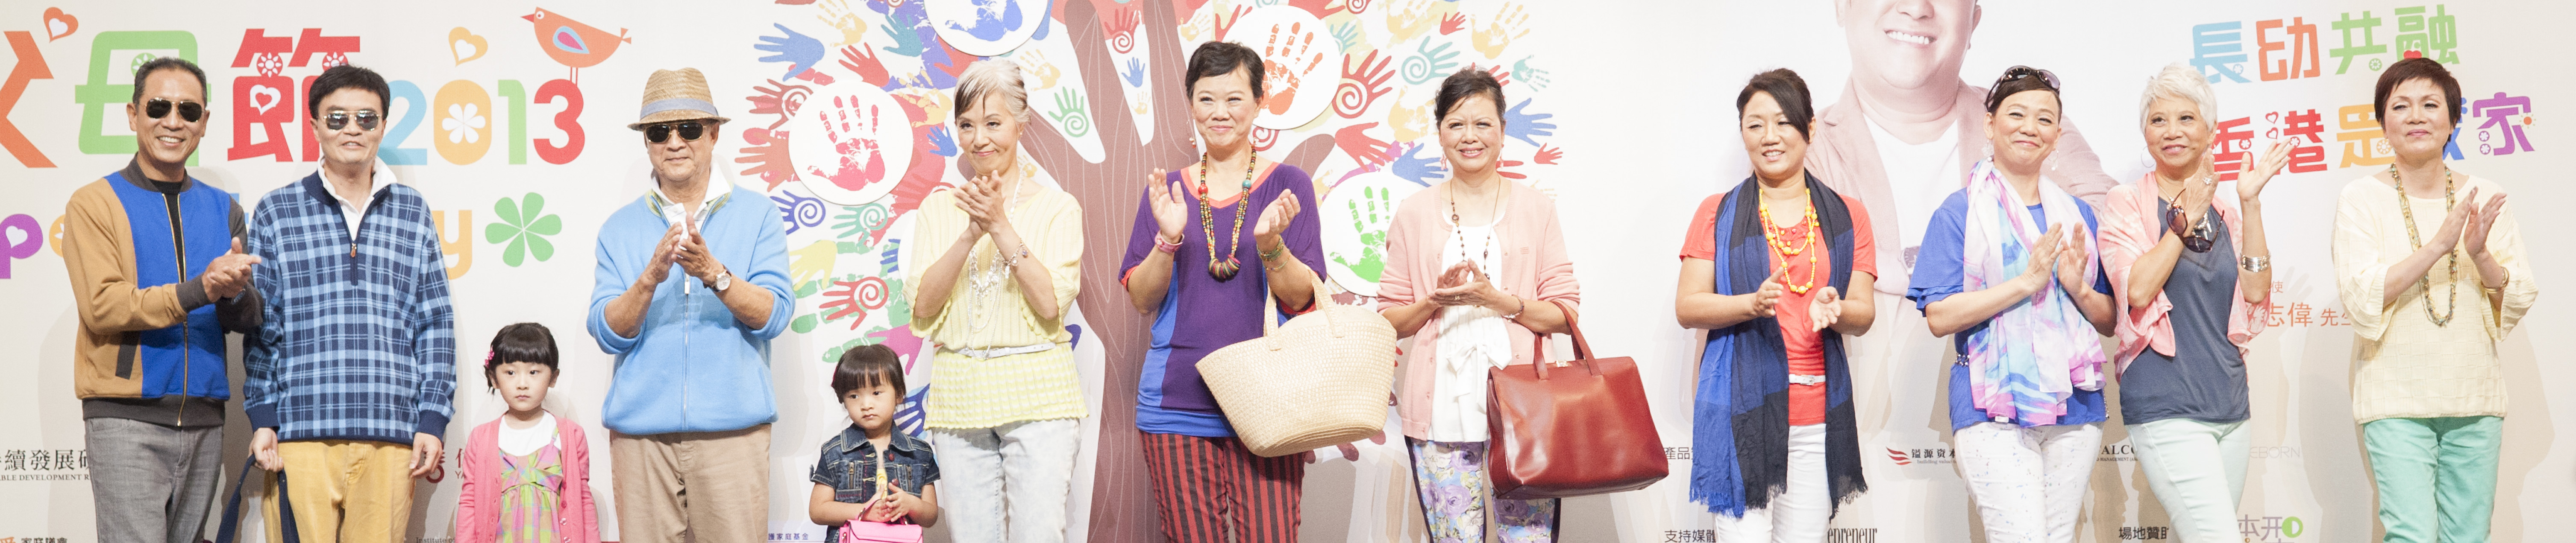 TVB Scoop Interview on Grandparents Day 2013